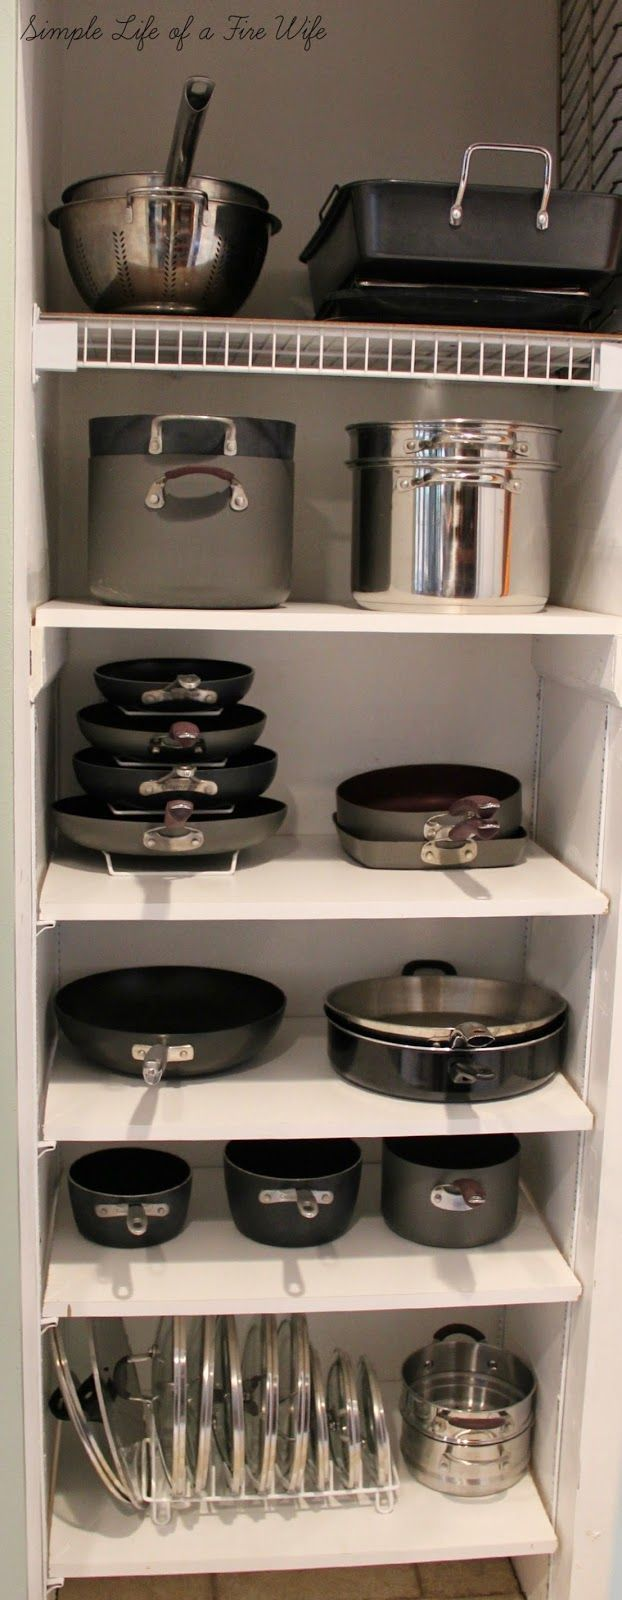 Cookware pantry cookware organization mplelifeofafirewife